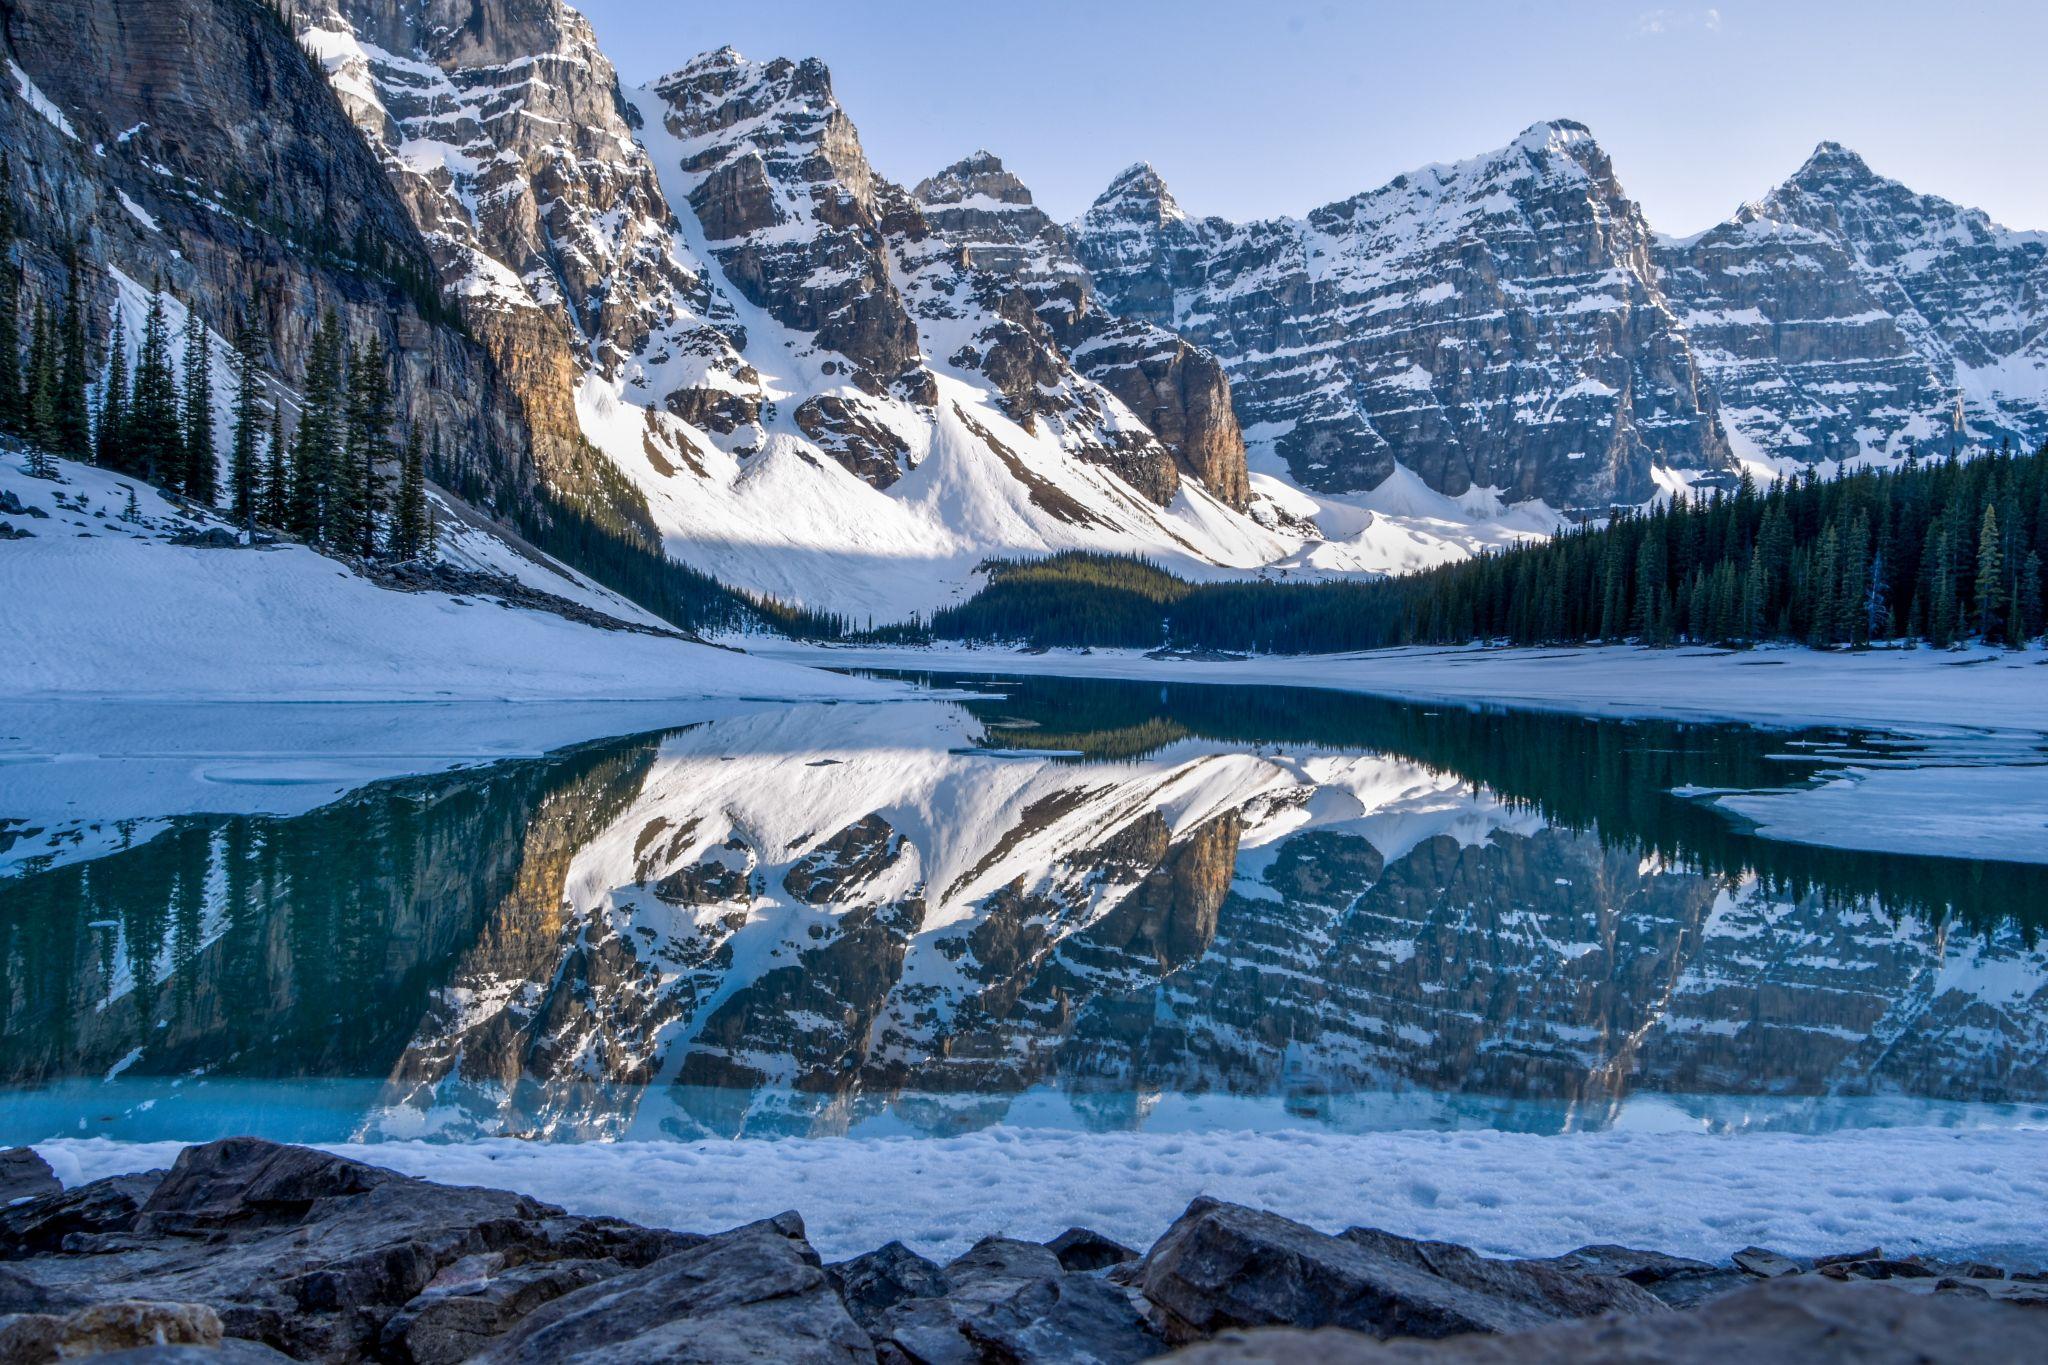 Moraine Lake - Banff National Park, Alberta, Canada, Canada